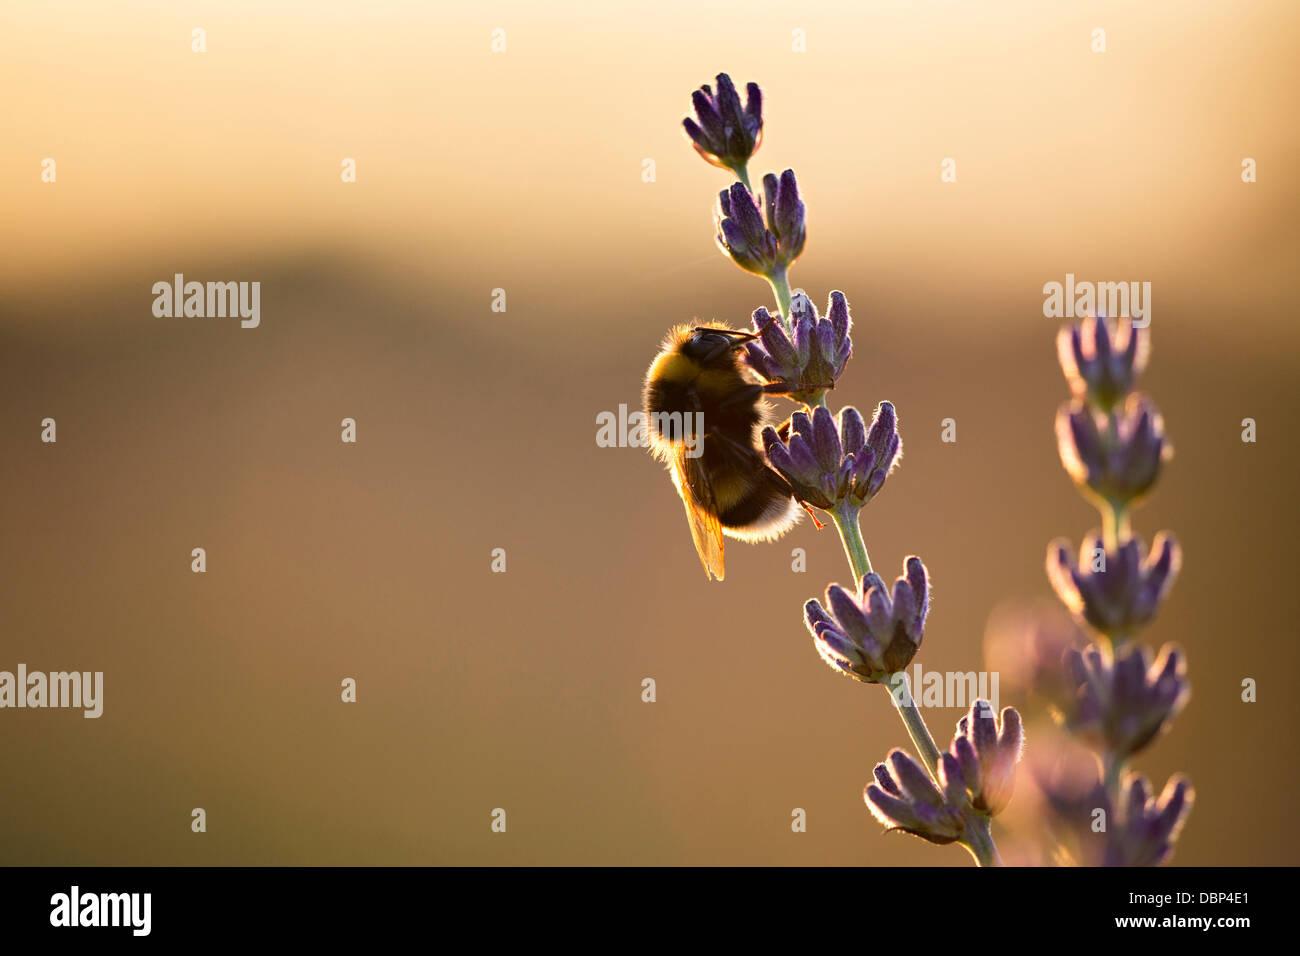 Bumblebee en campo lila, Isla de Hvar, Croacia, Europa Foto de stock